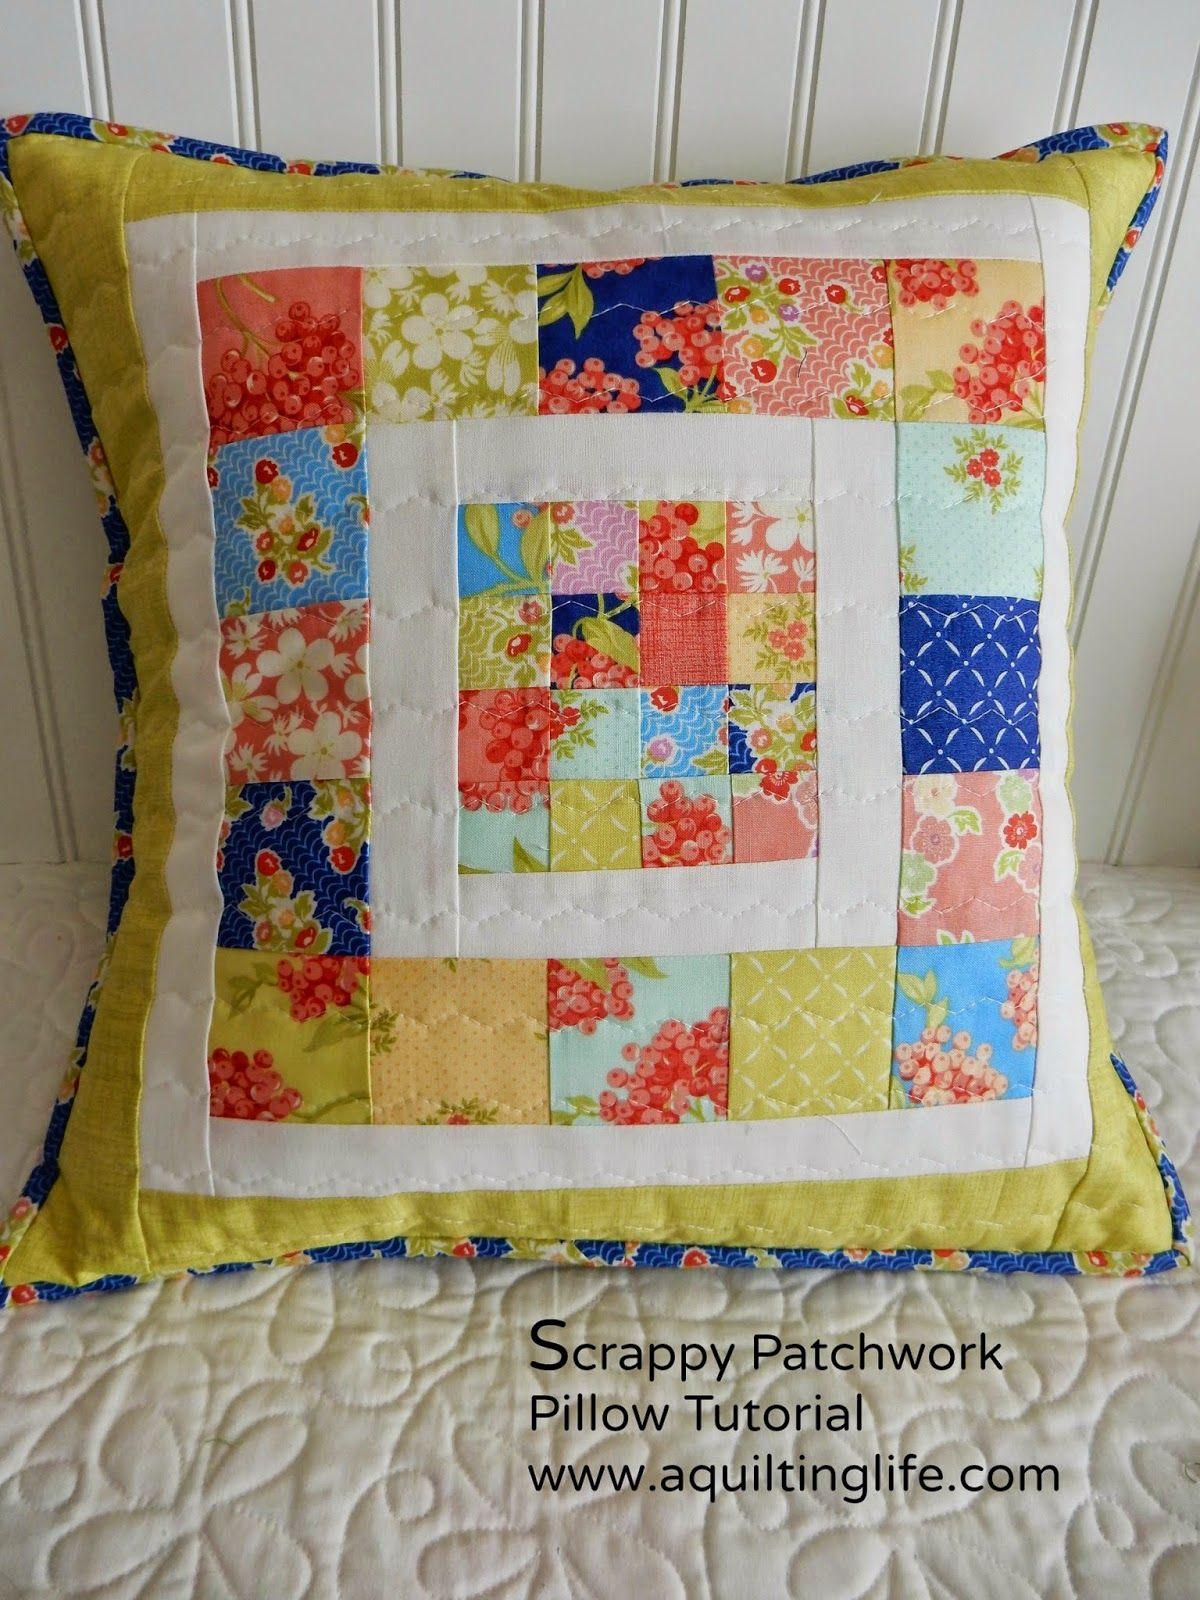 Tutorial De Cojines De Patchwork.Scrappy Patchwork Pillow Tutorial A Quilting Life